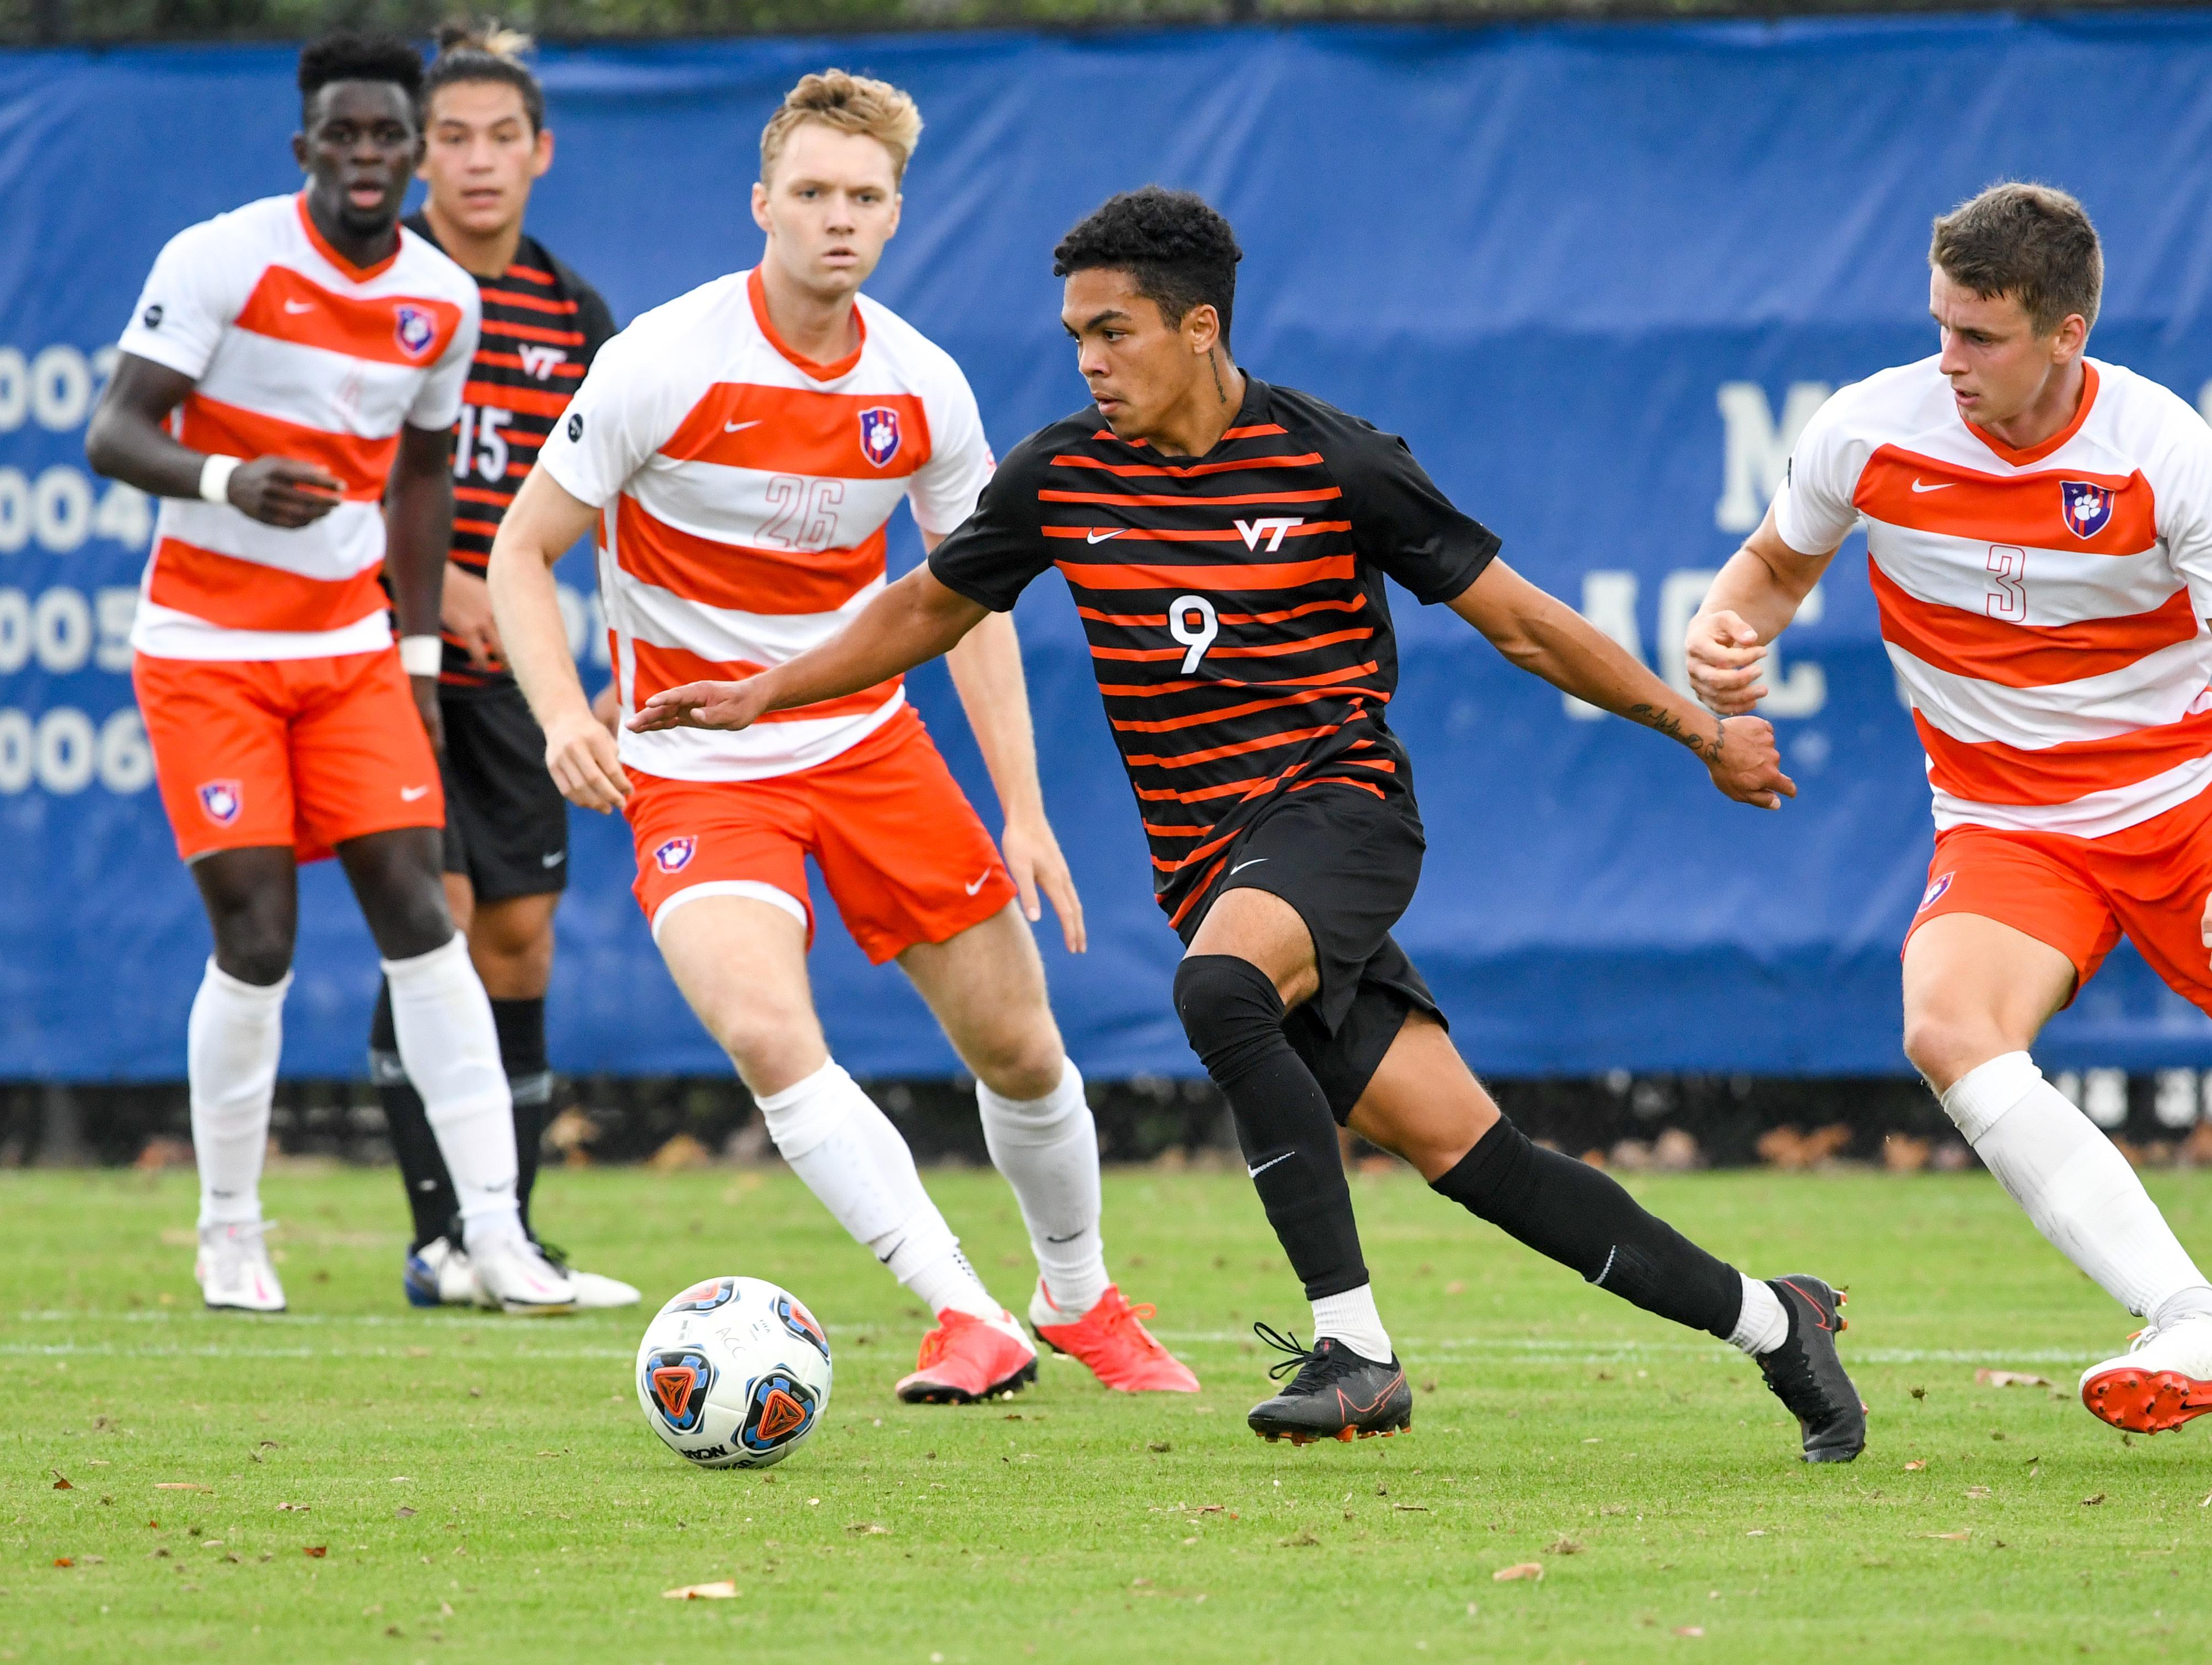 Austin FC select Virginia Tech midfielder Daniel Pereira at No. 1 in 2021 MLS SuperDraft | MLSSoccer.com